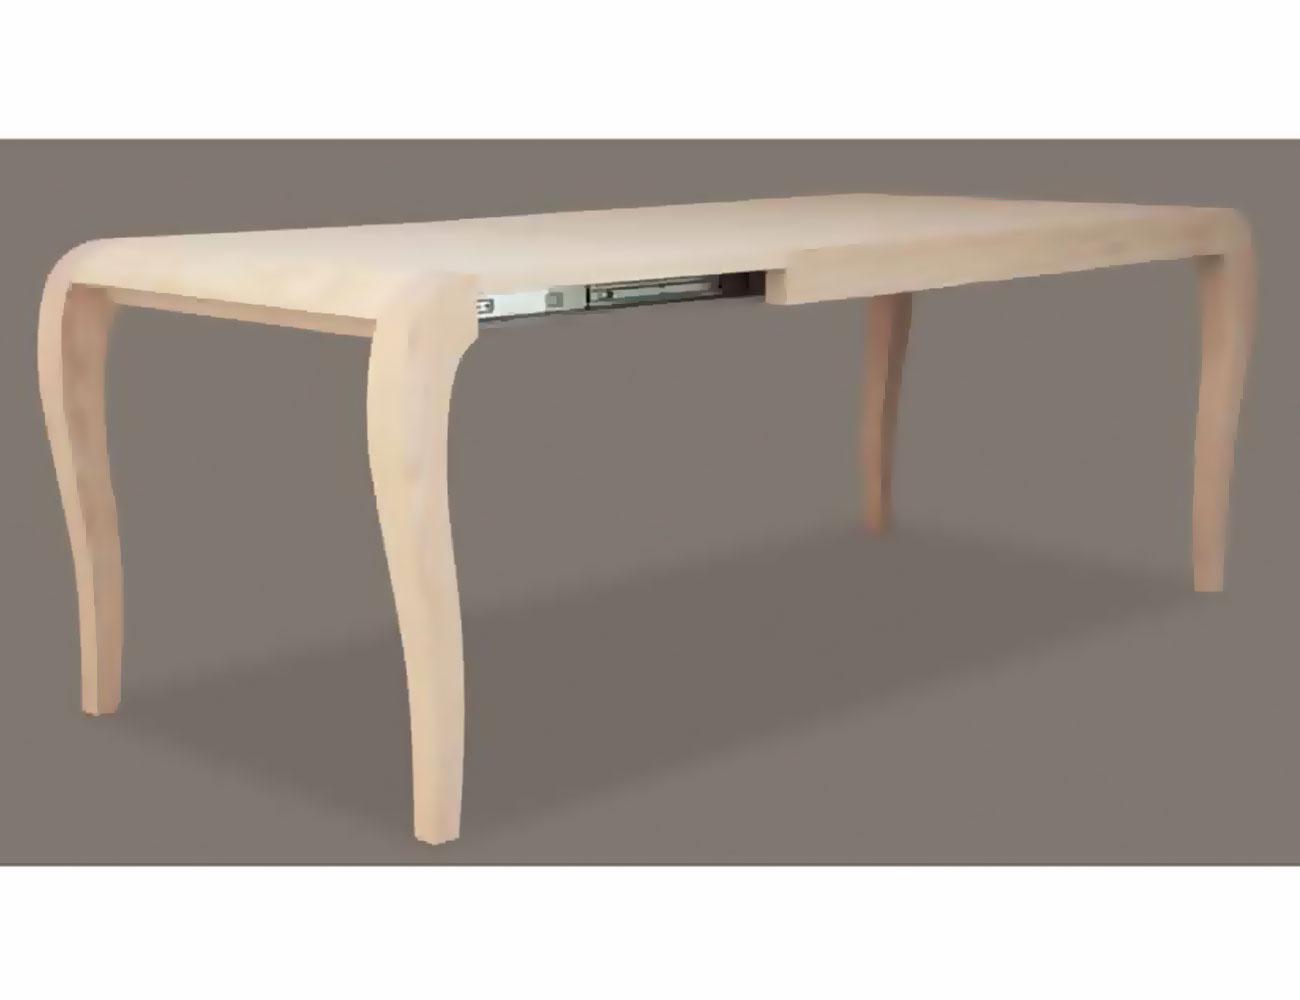 Mesa comedor fija 140 cm en madera con patas isabelina for Mesa 60 x 60 extensible